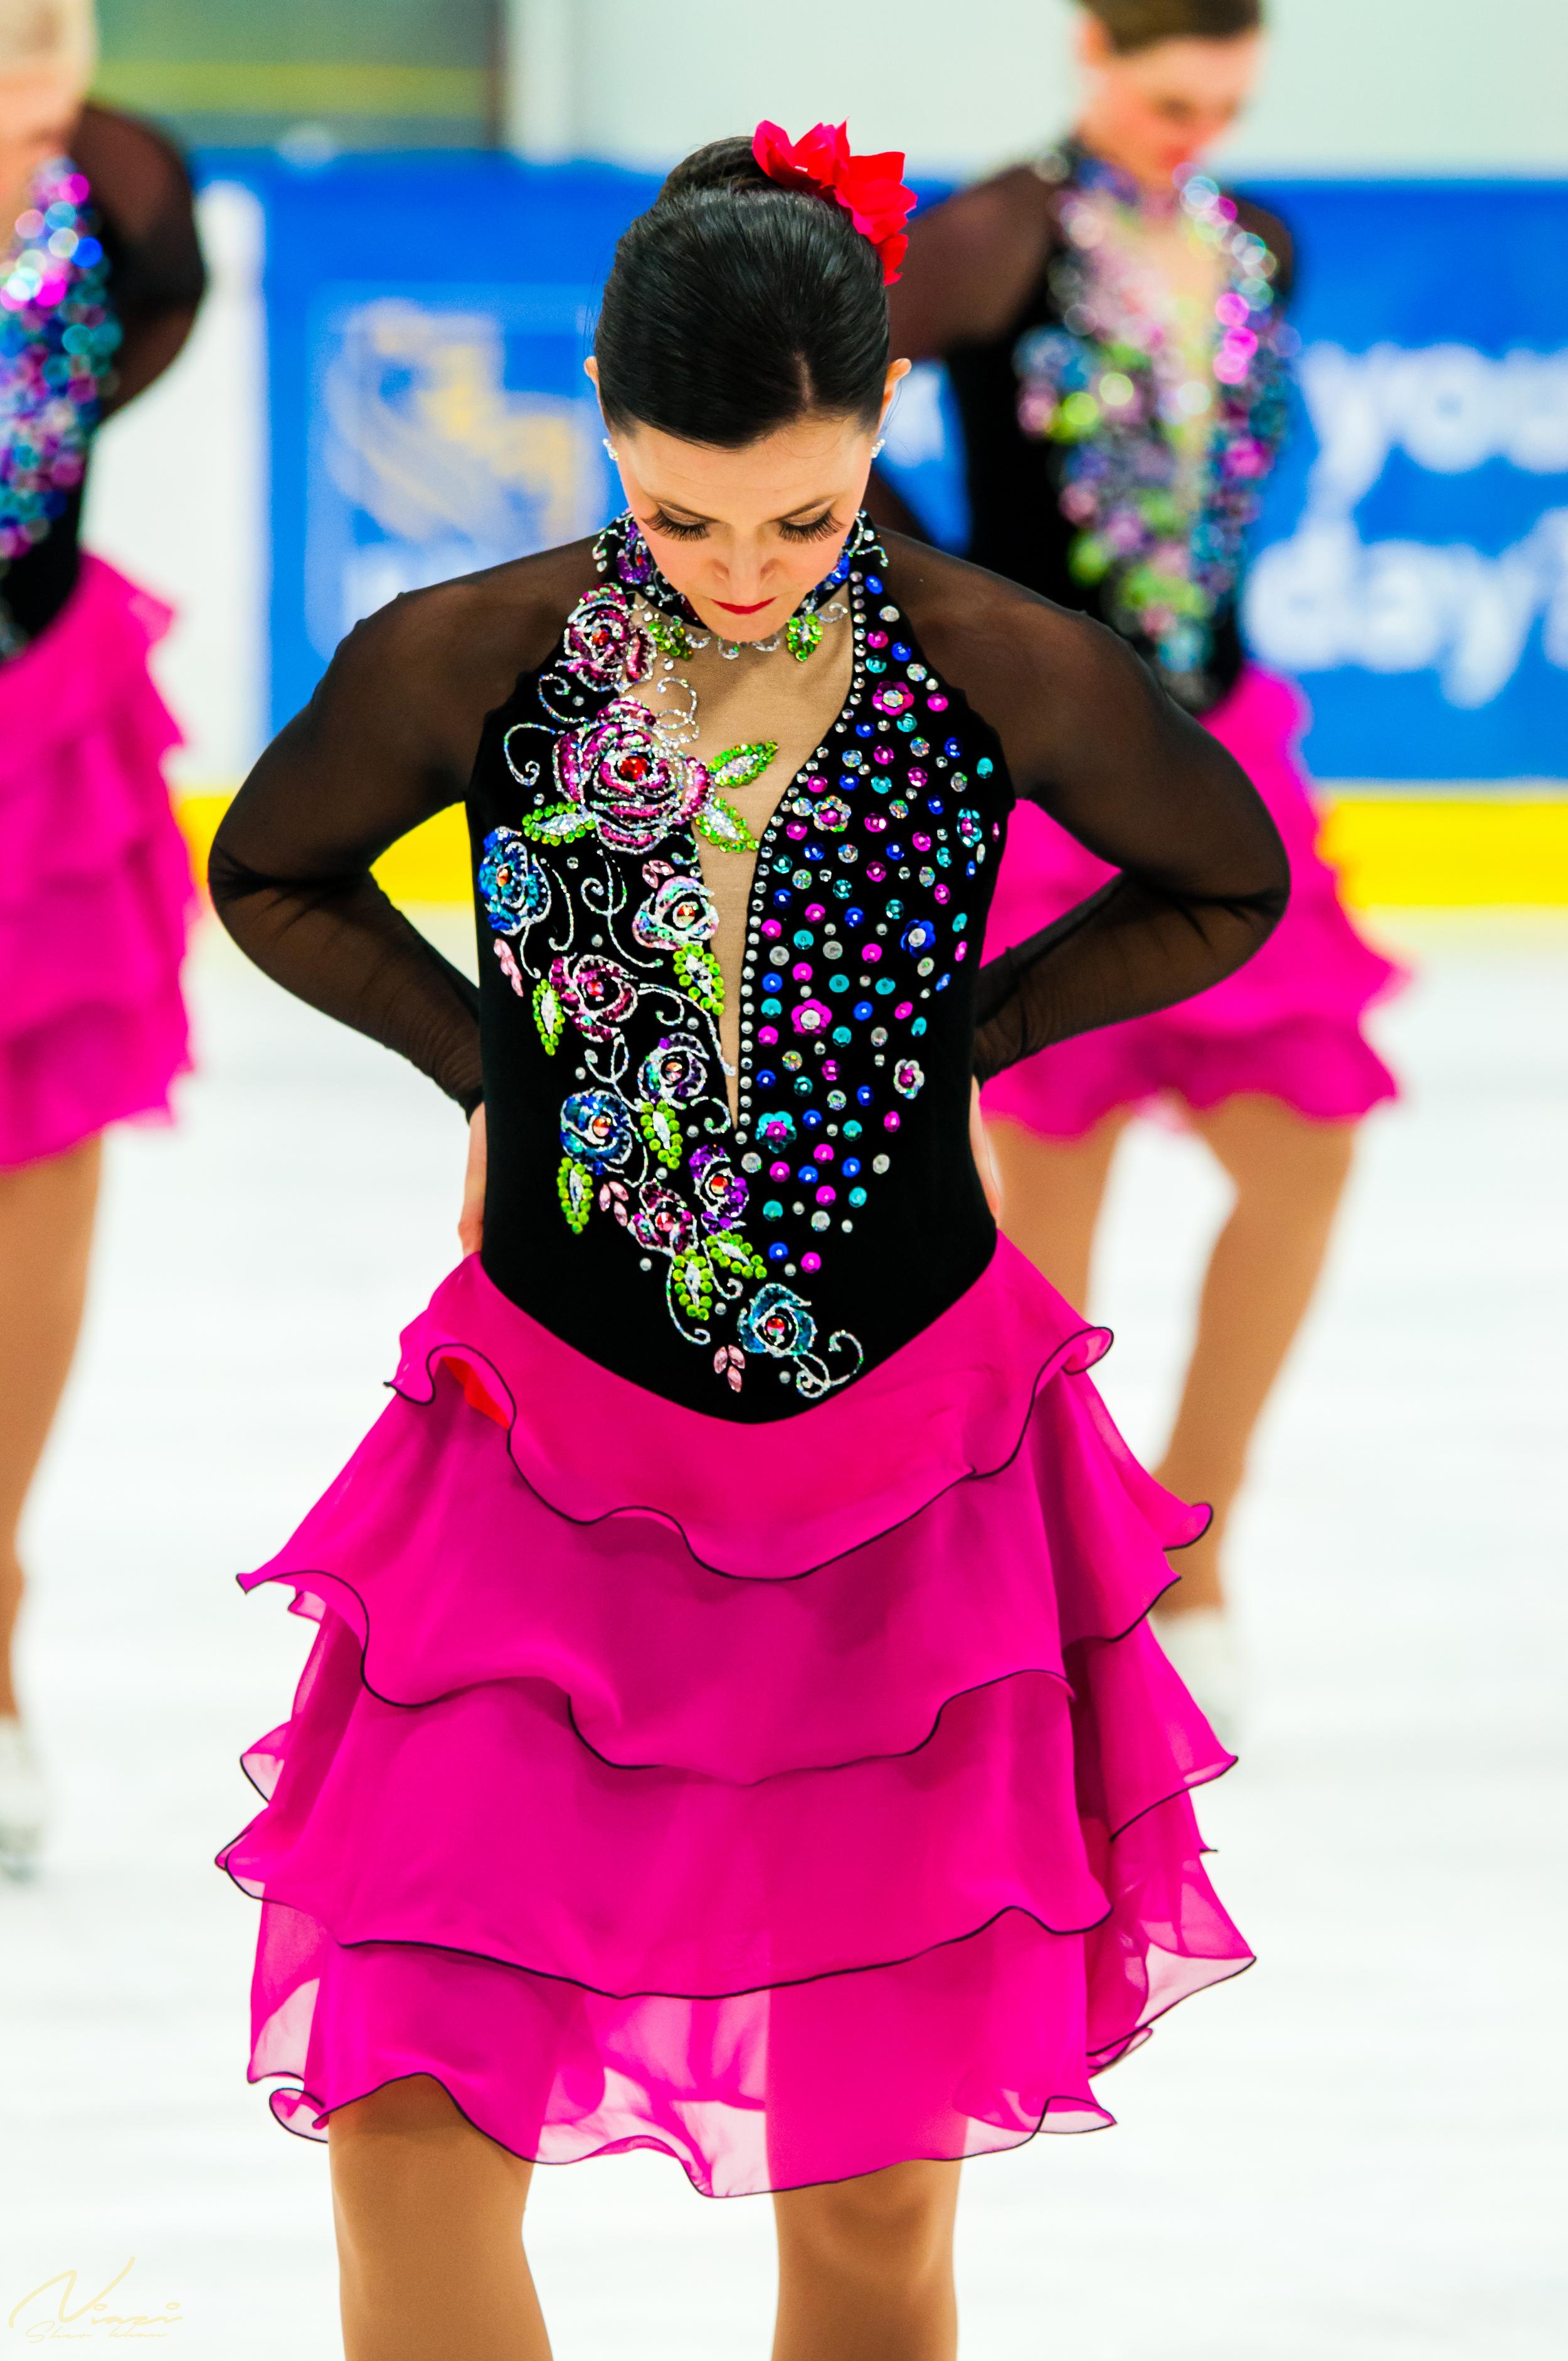 Sher Khan Niazi-Skating-0599.jpg